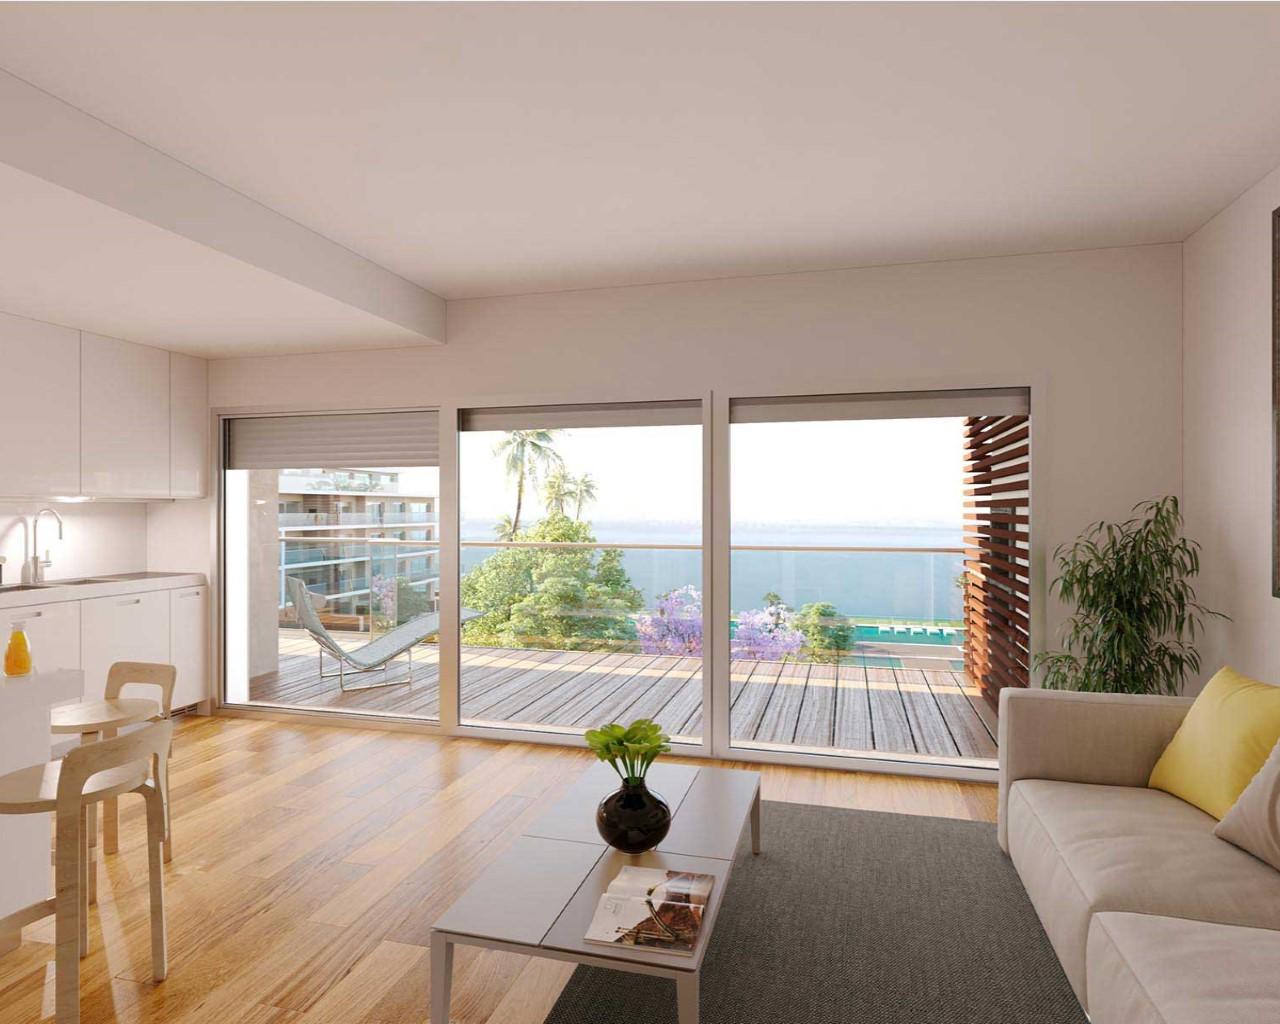 Tagus Bay - Living room